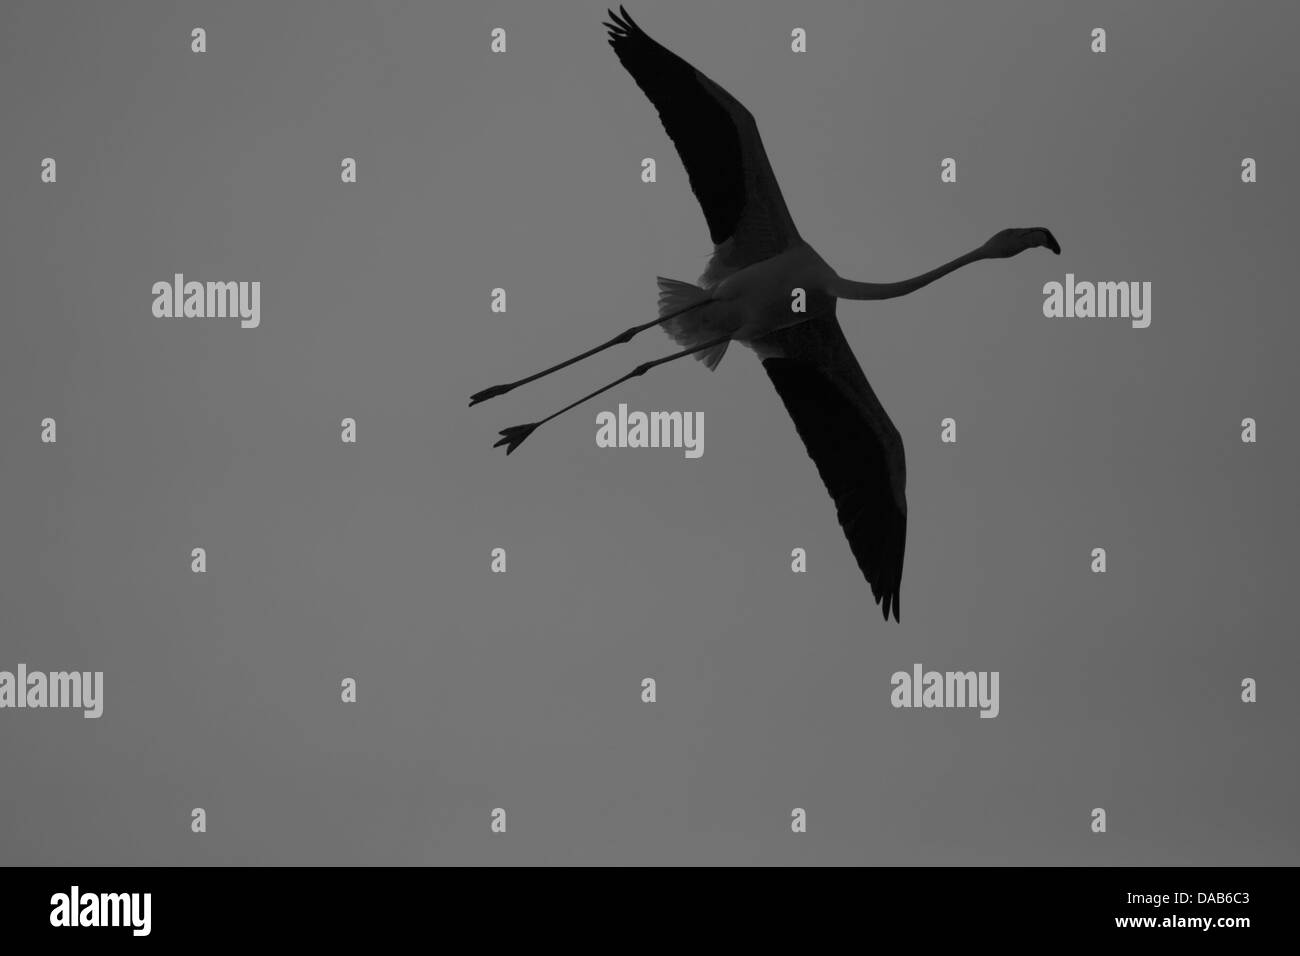 Flying flamingo in France Stock Photo